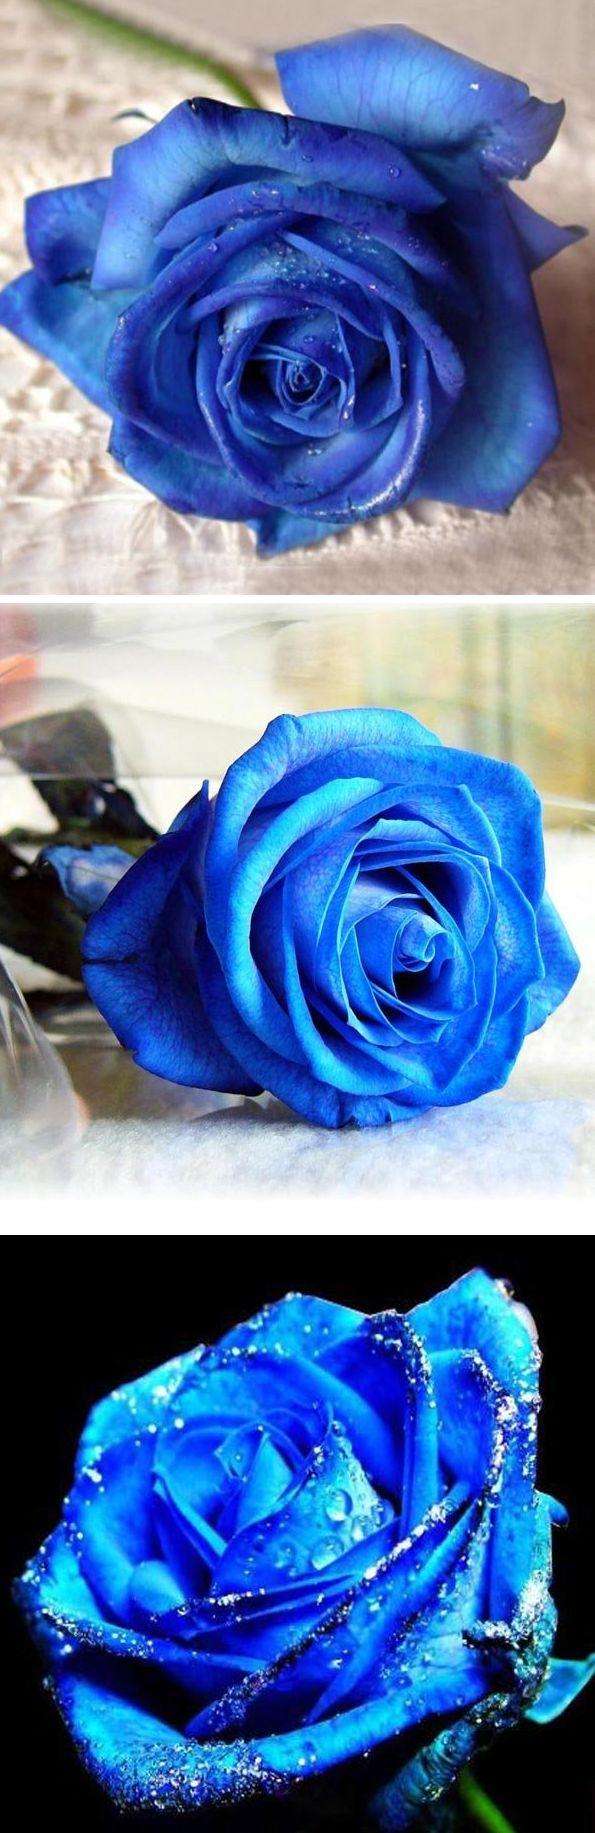 US$2.89 50 Pcs Blue Rose Seeds DIY Home Garden Dec